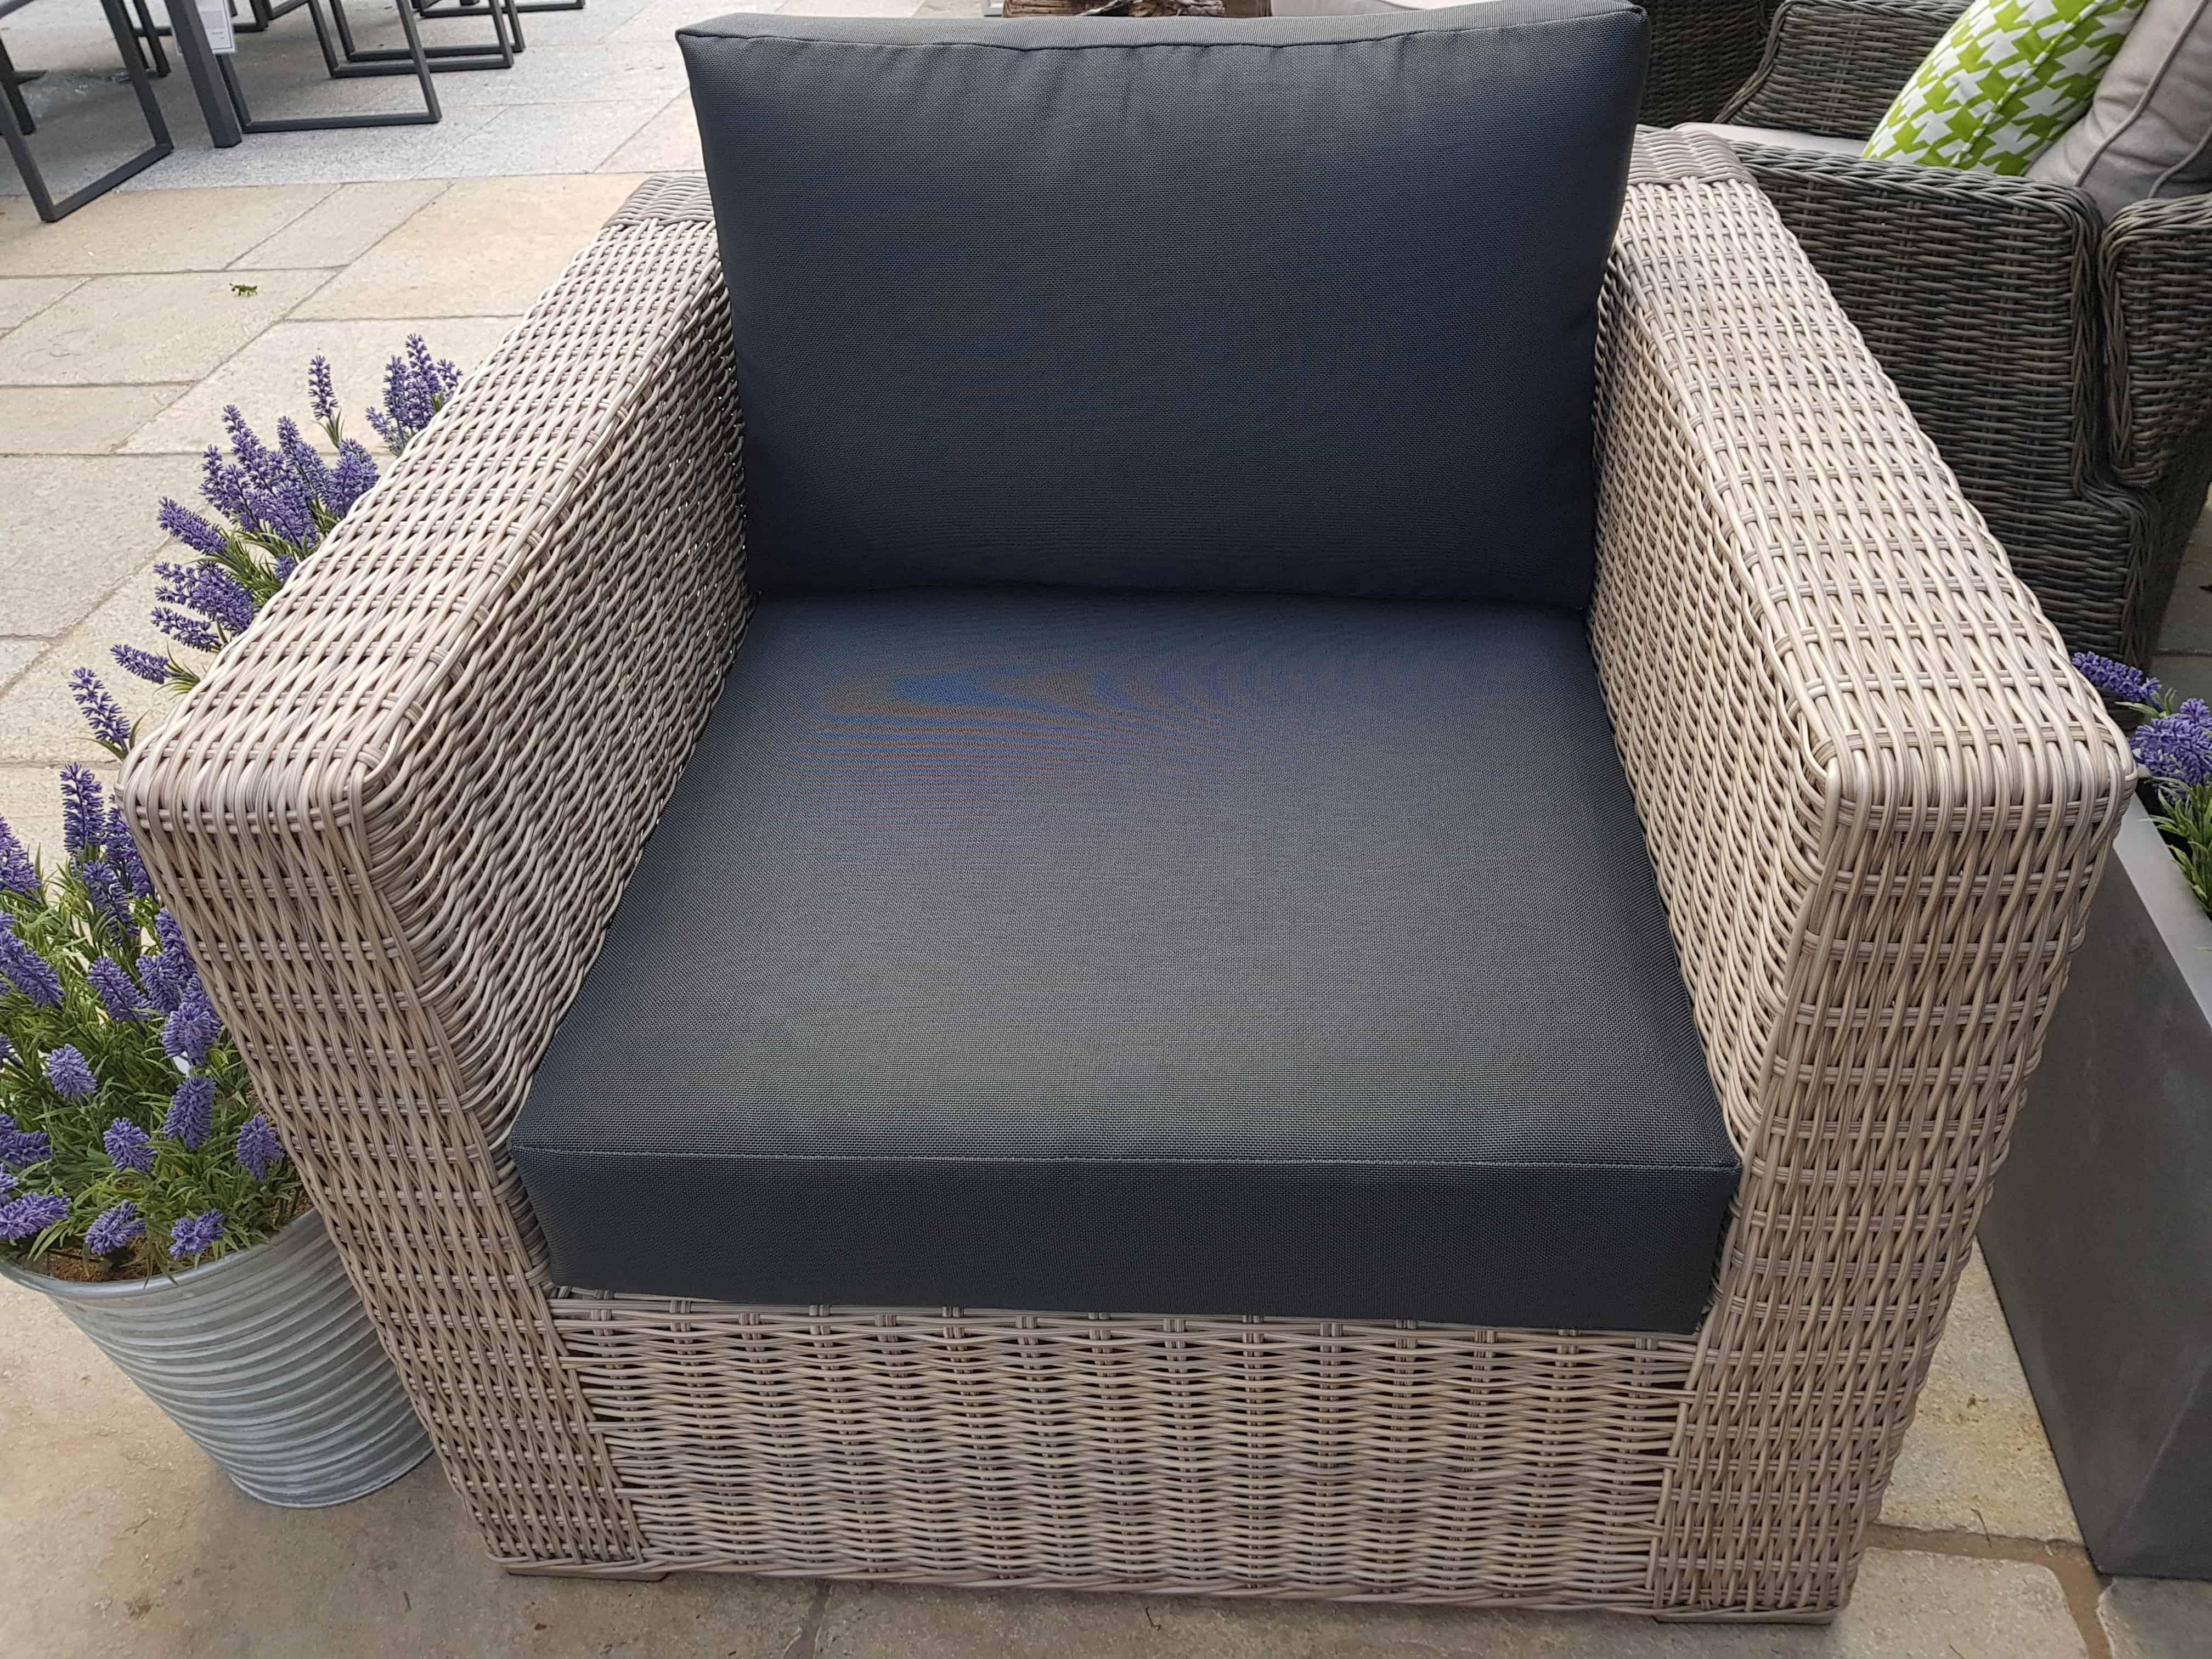 Valencia armchair outdoor furniture for sale dublin ireland